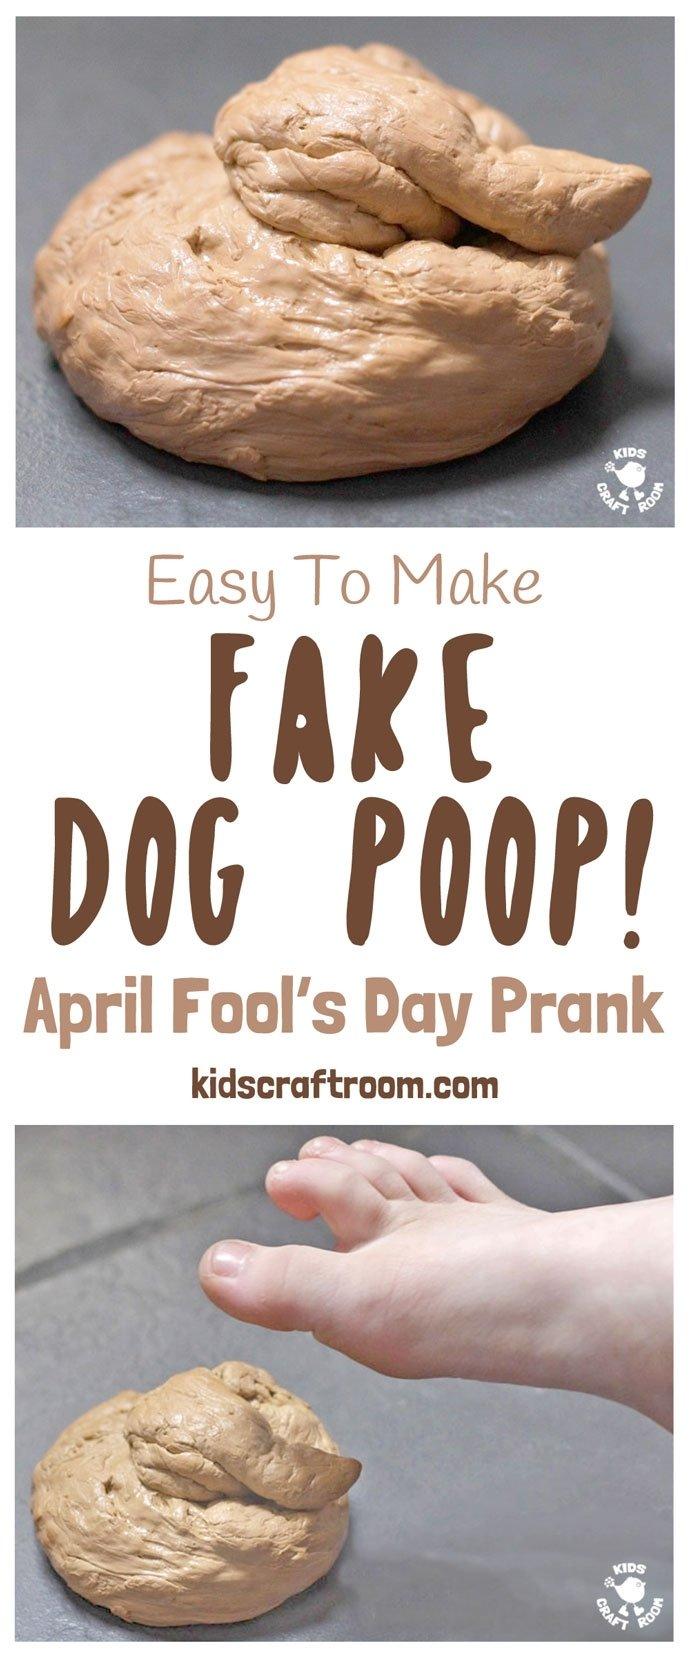 10 Wonderful April Fools Ideas For Kids fake dog poop april fools day prank kids craft room 2020